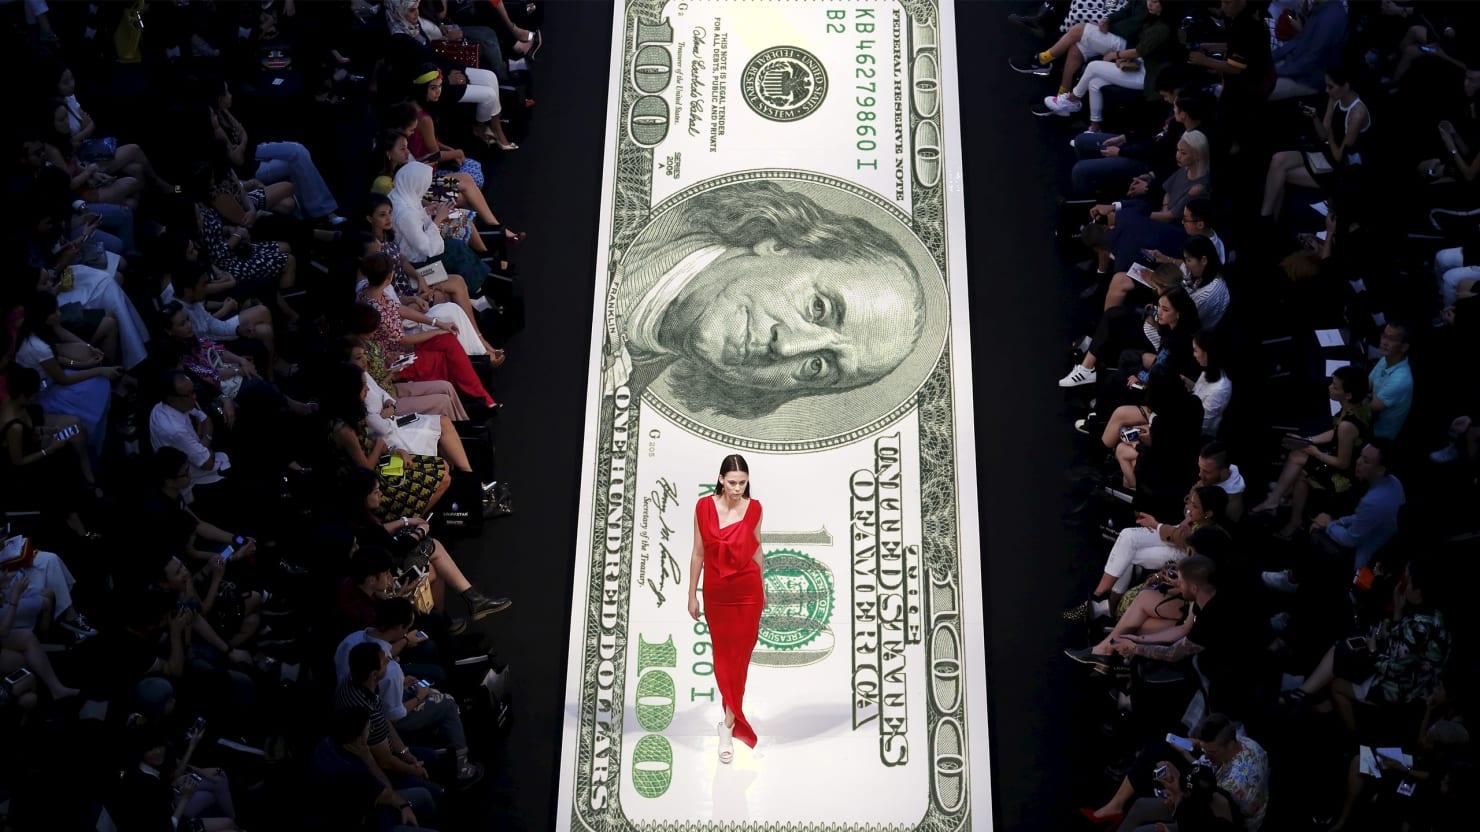 Pay Models Properly: Inside Fashion's Unfair Favor Economy